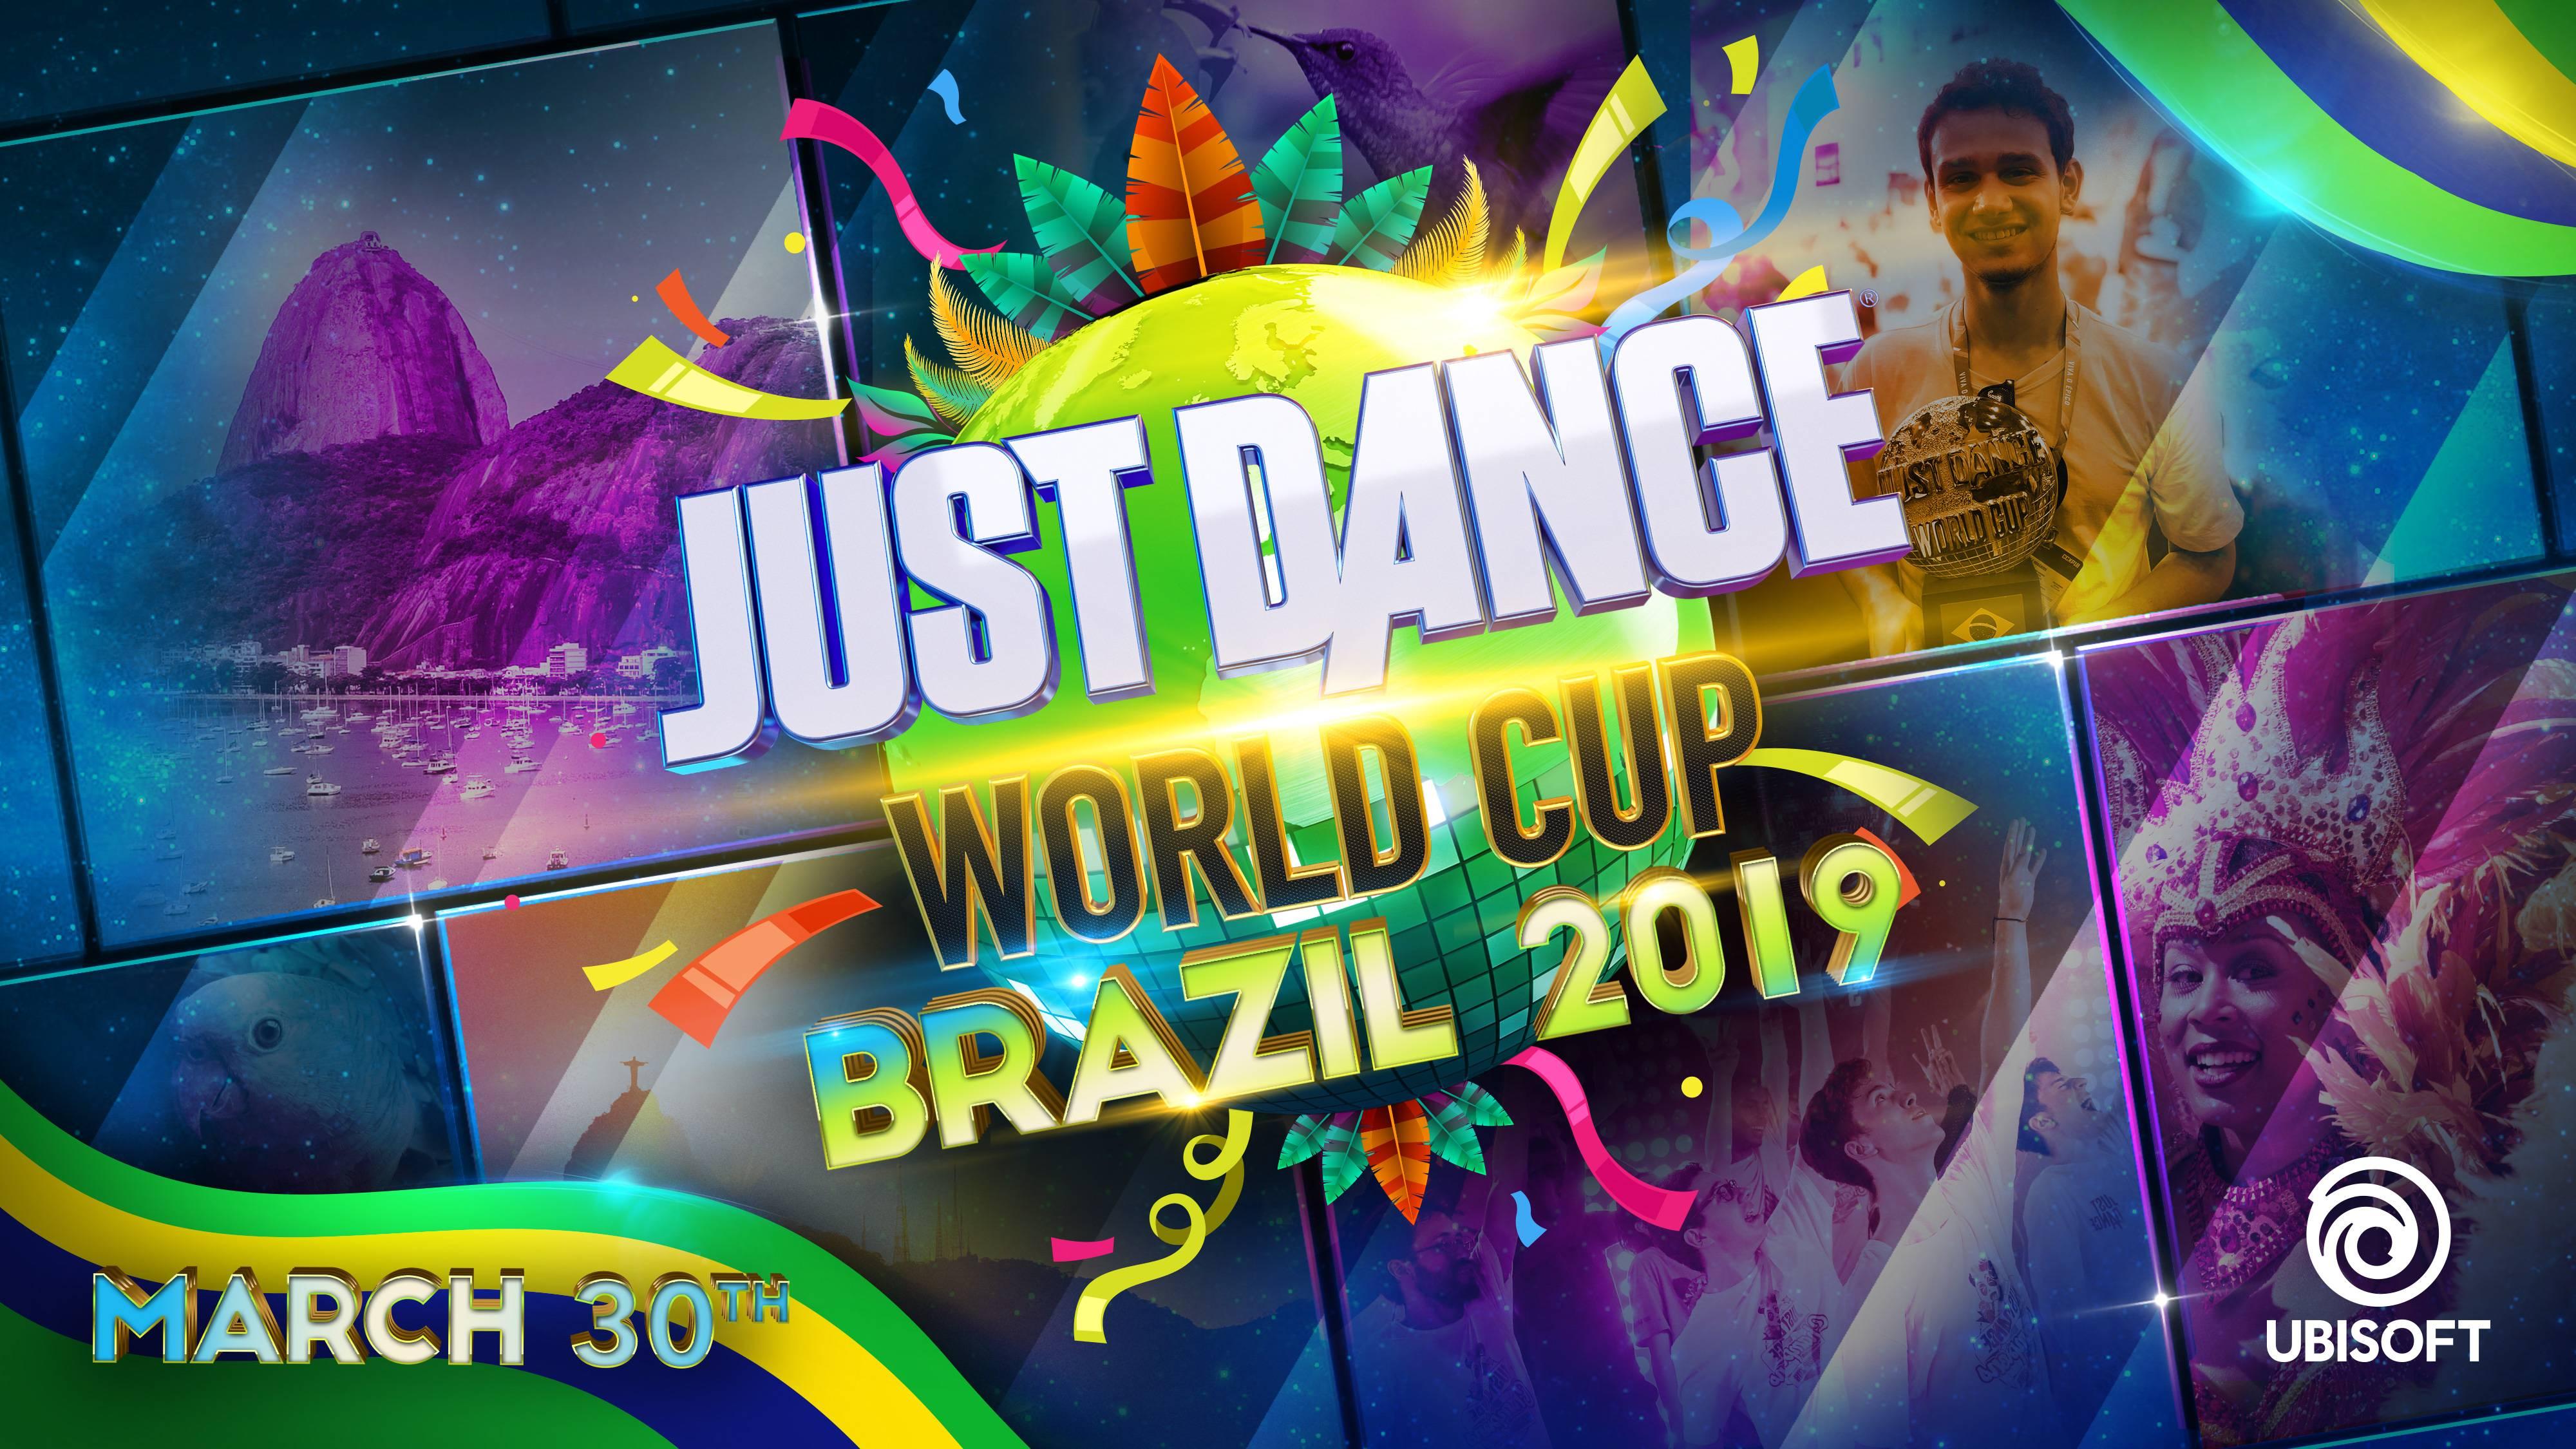 Campionato Mondiale 2019 di Just Dance in Brasile thumbnail